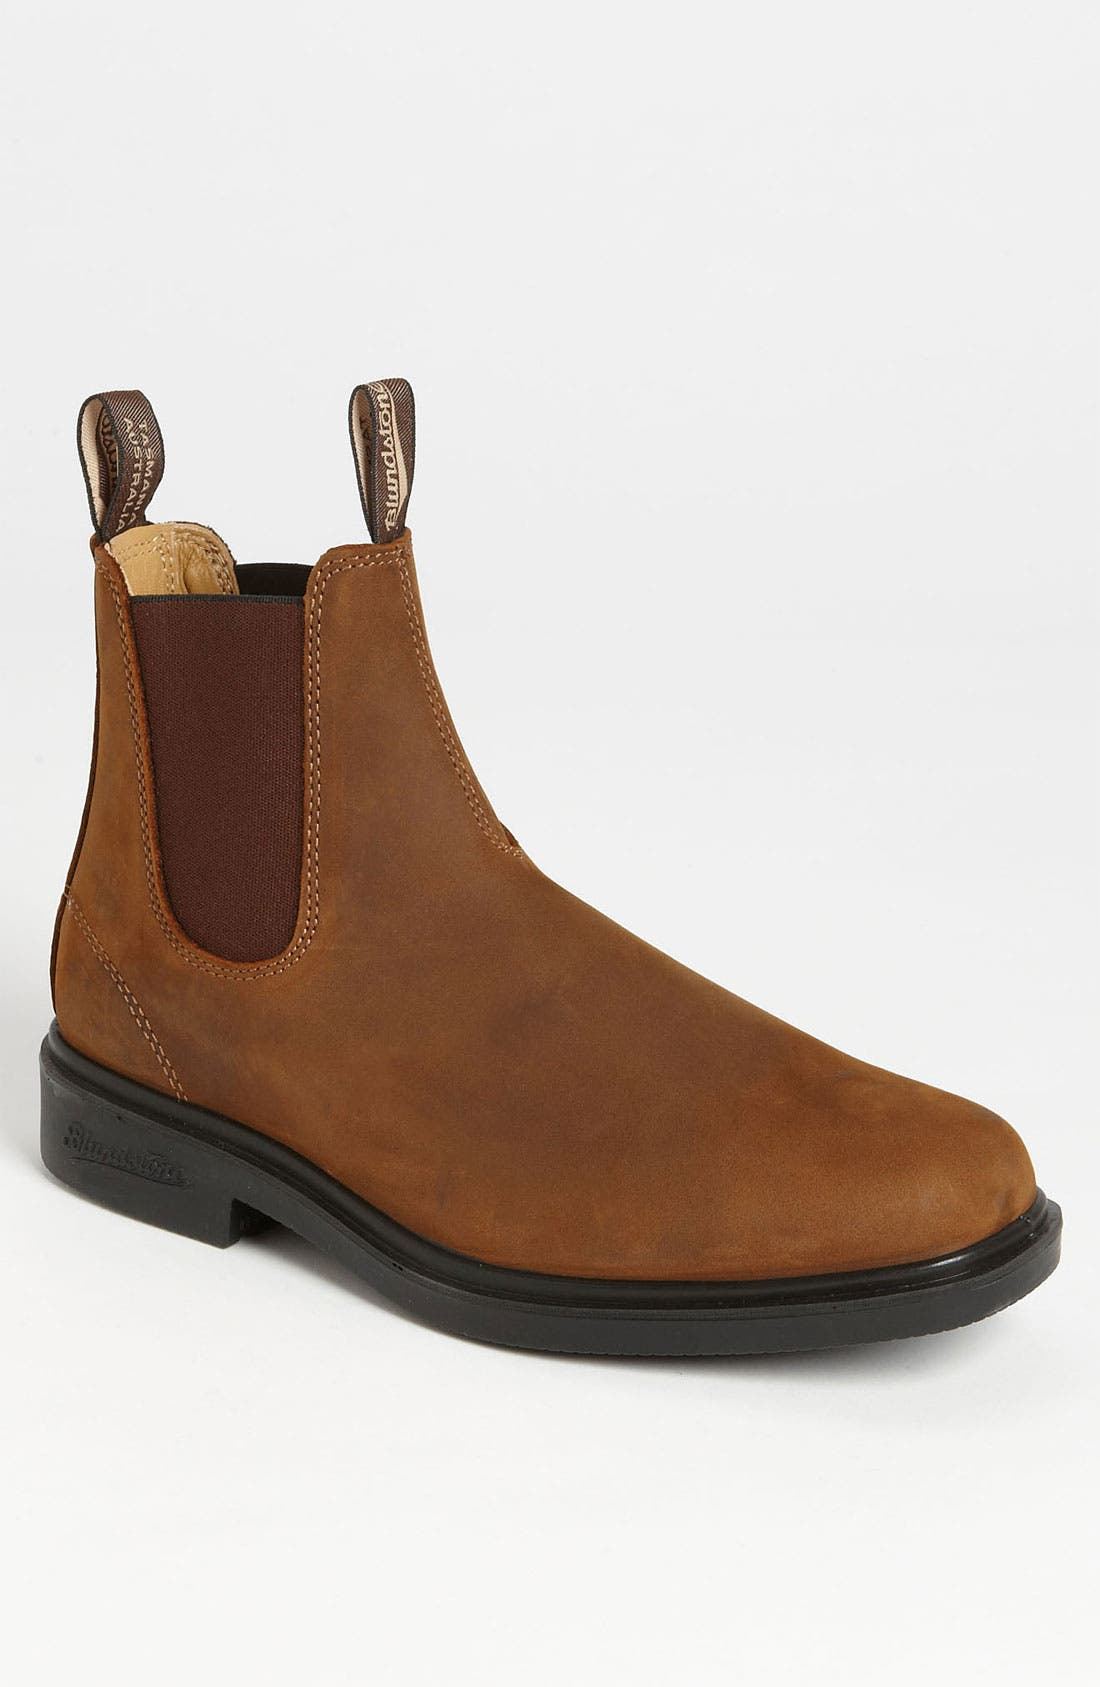 Alternate Image 1 Selected - Blundstone Footwear Chelsea Boot (Online Only)